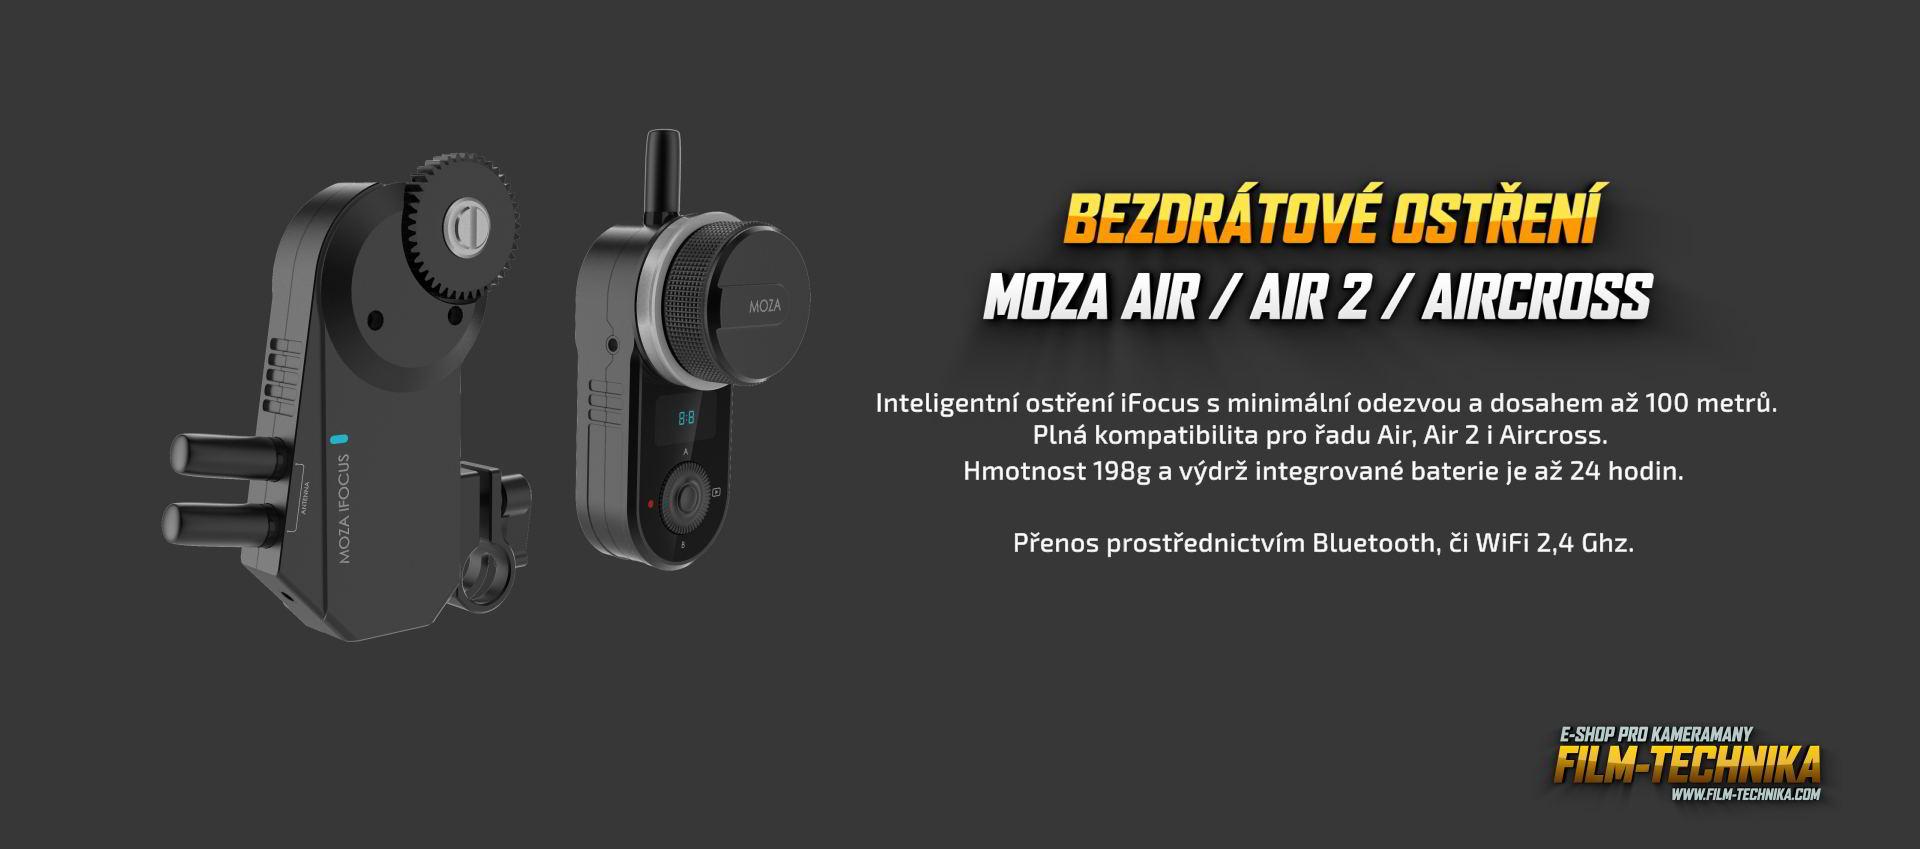 Moza_air_ostreni